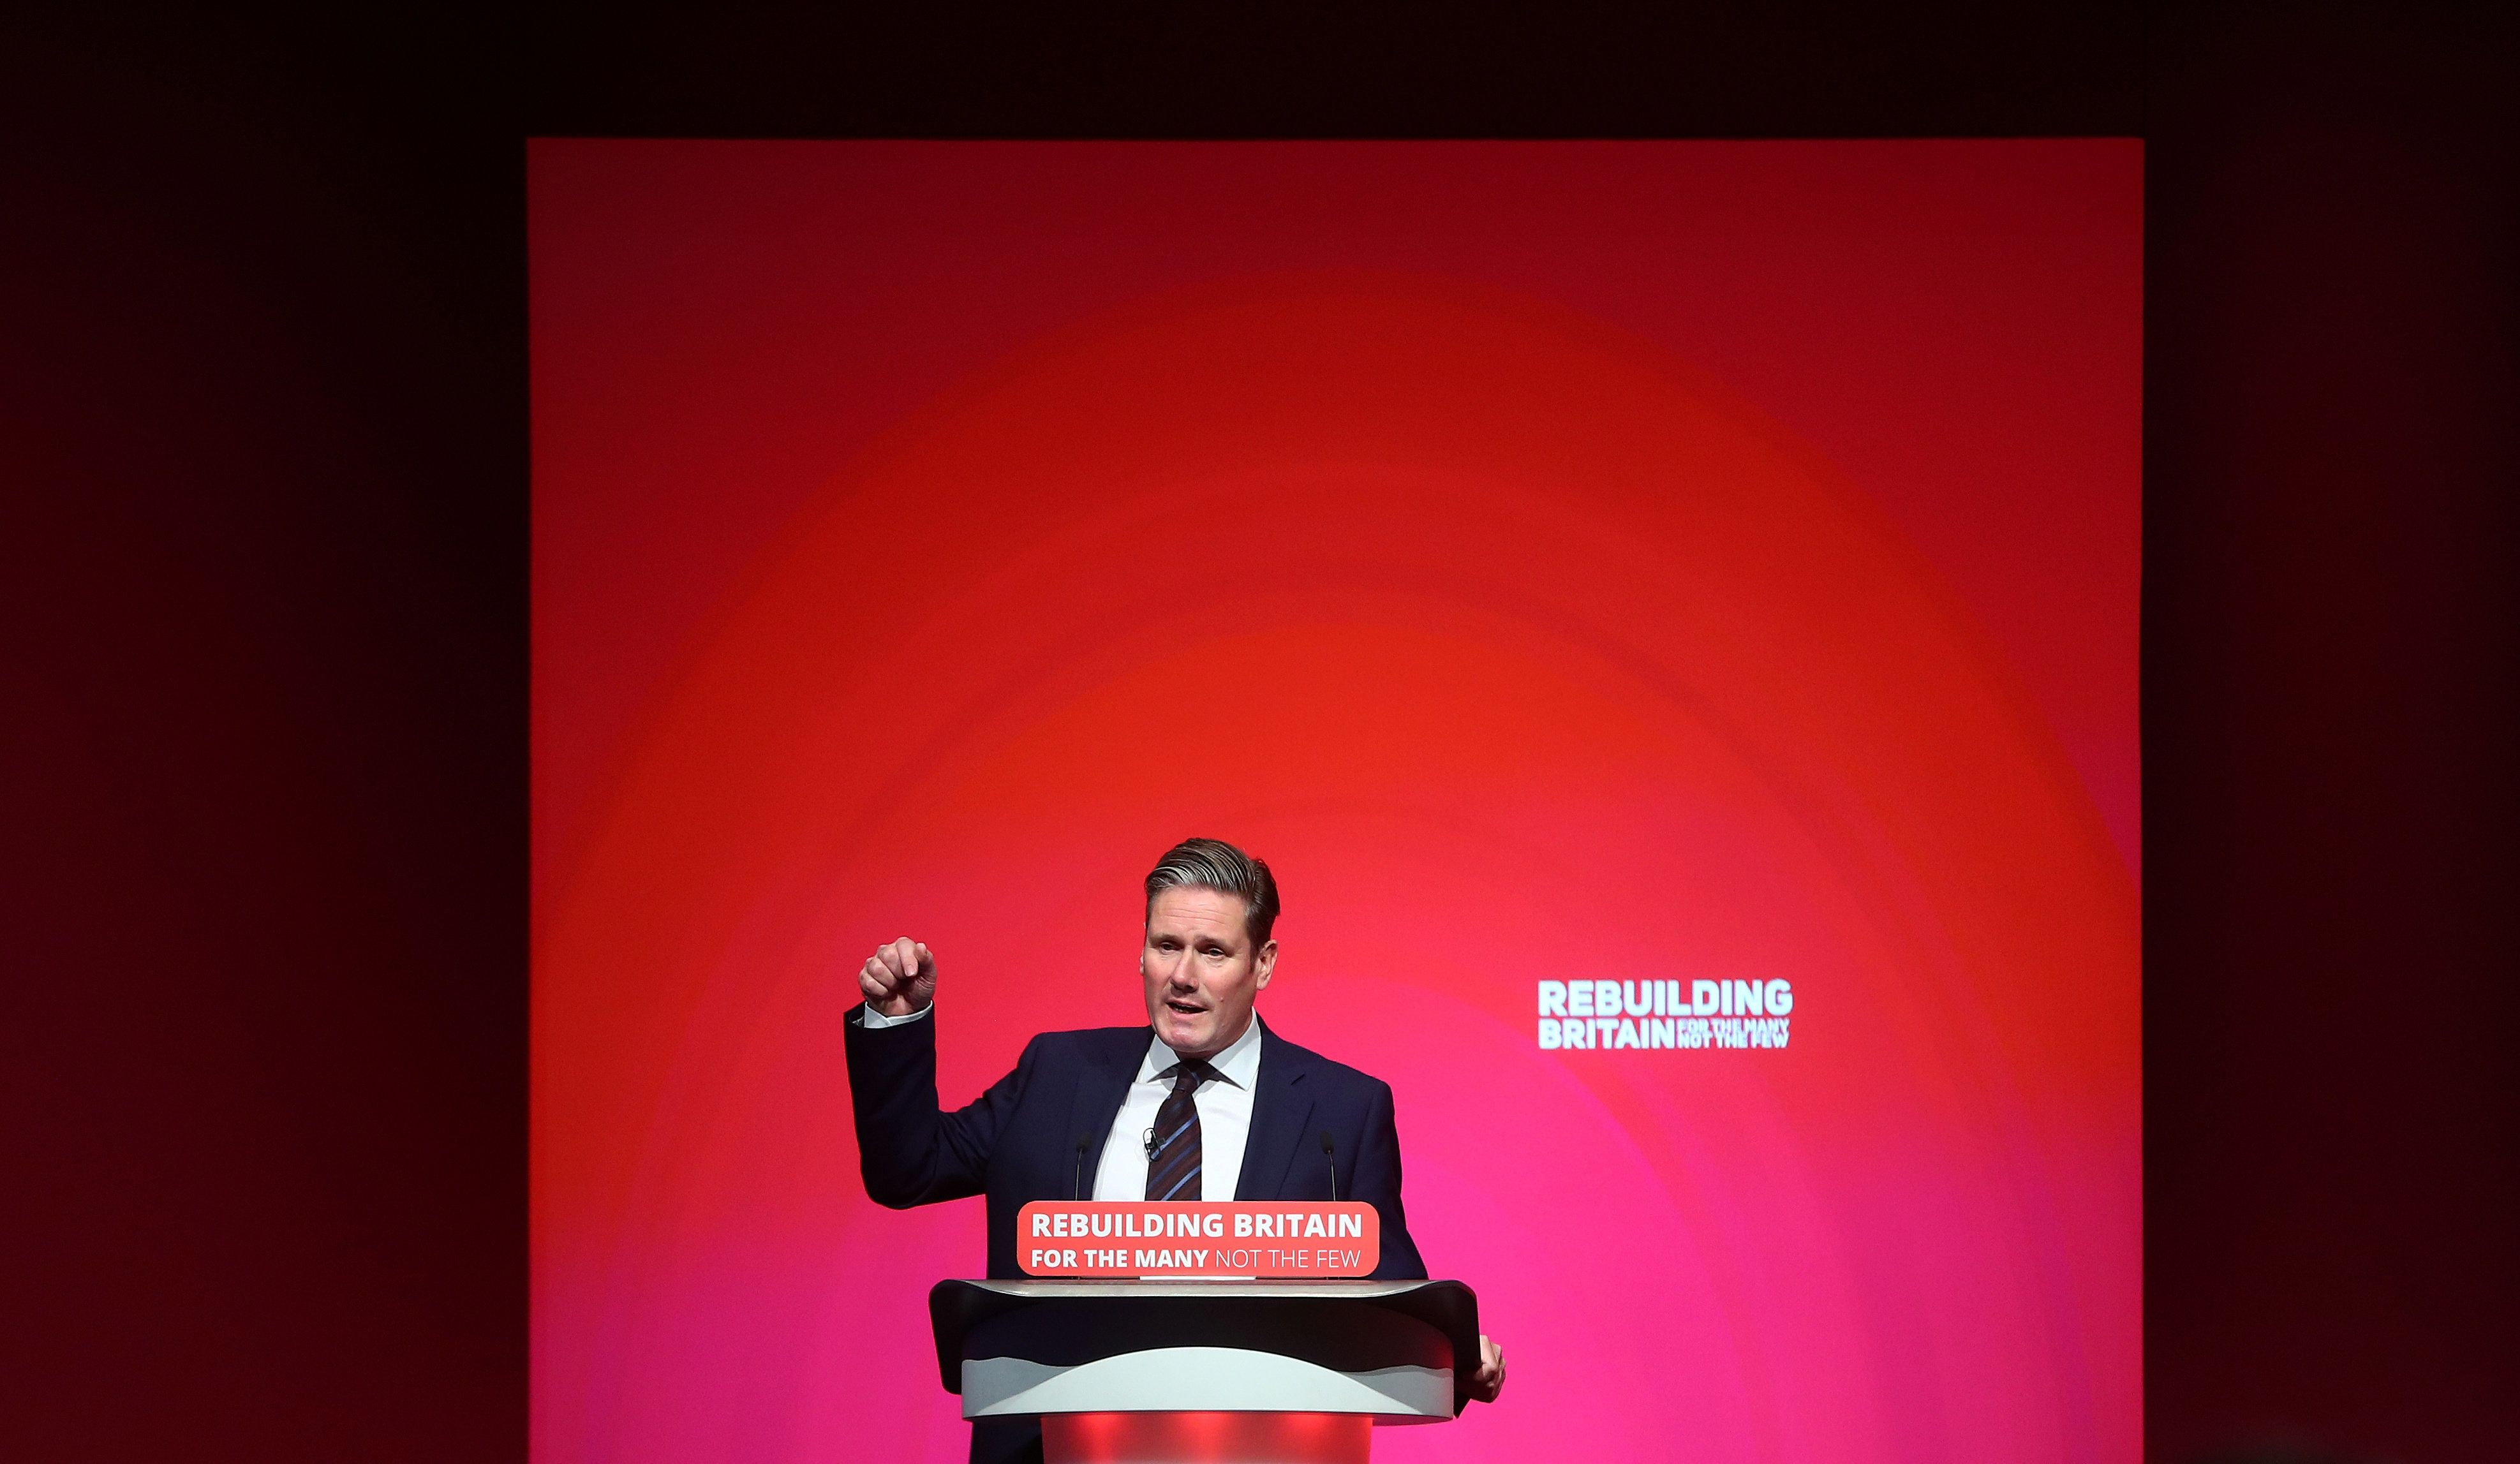 Brexit-Absage? Labour-Politiker macht folgenschweres